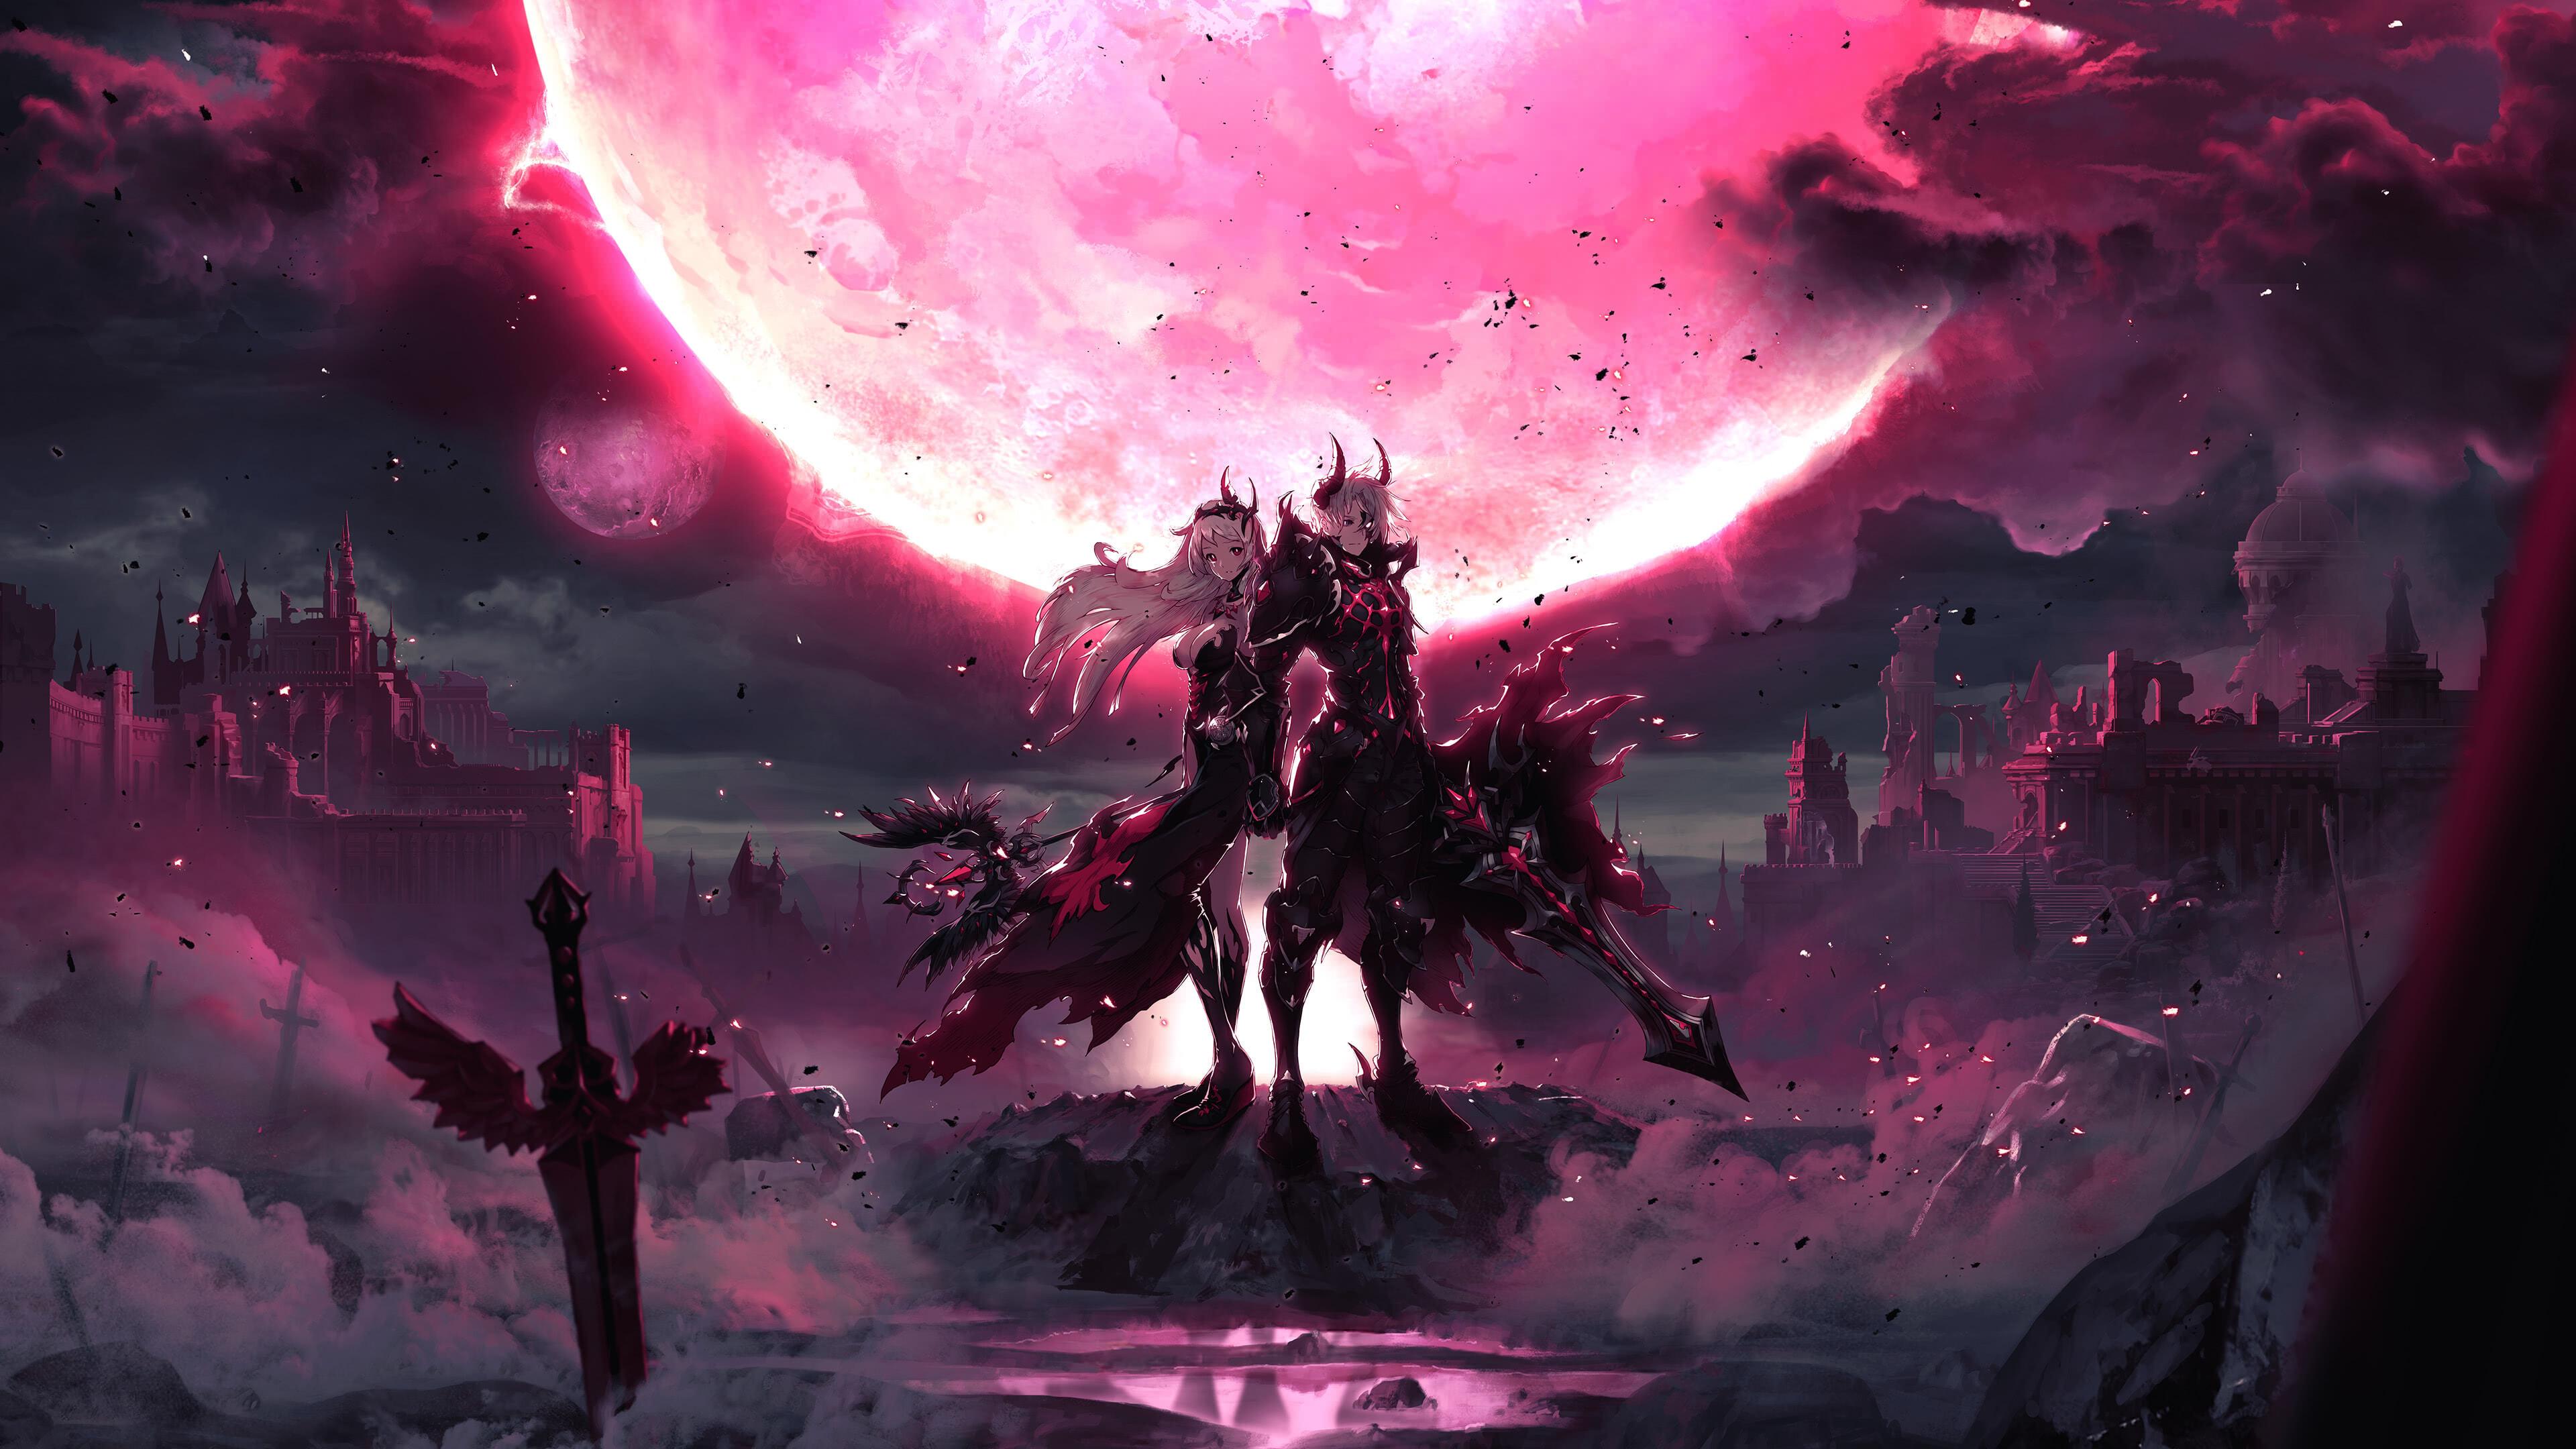 Kings Raid Pandemoniumx Uhd 4k Wallpaper Pixelz